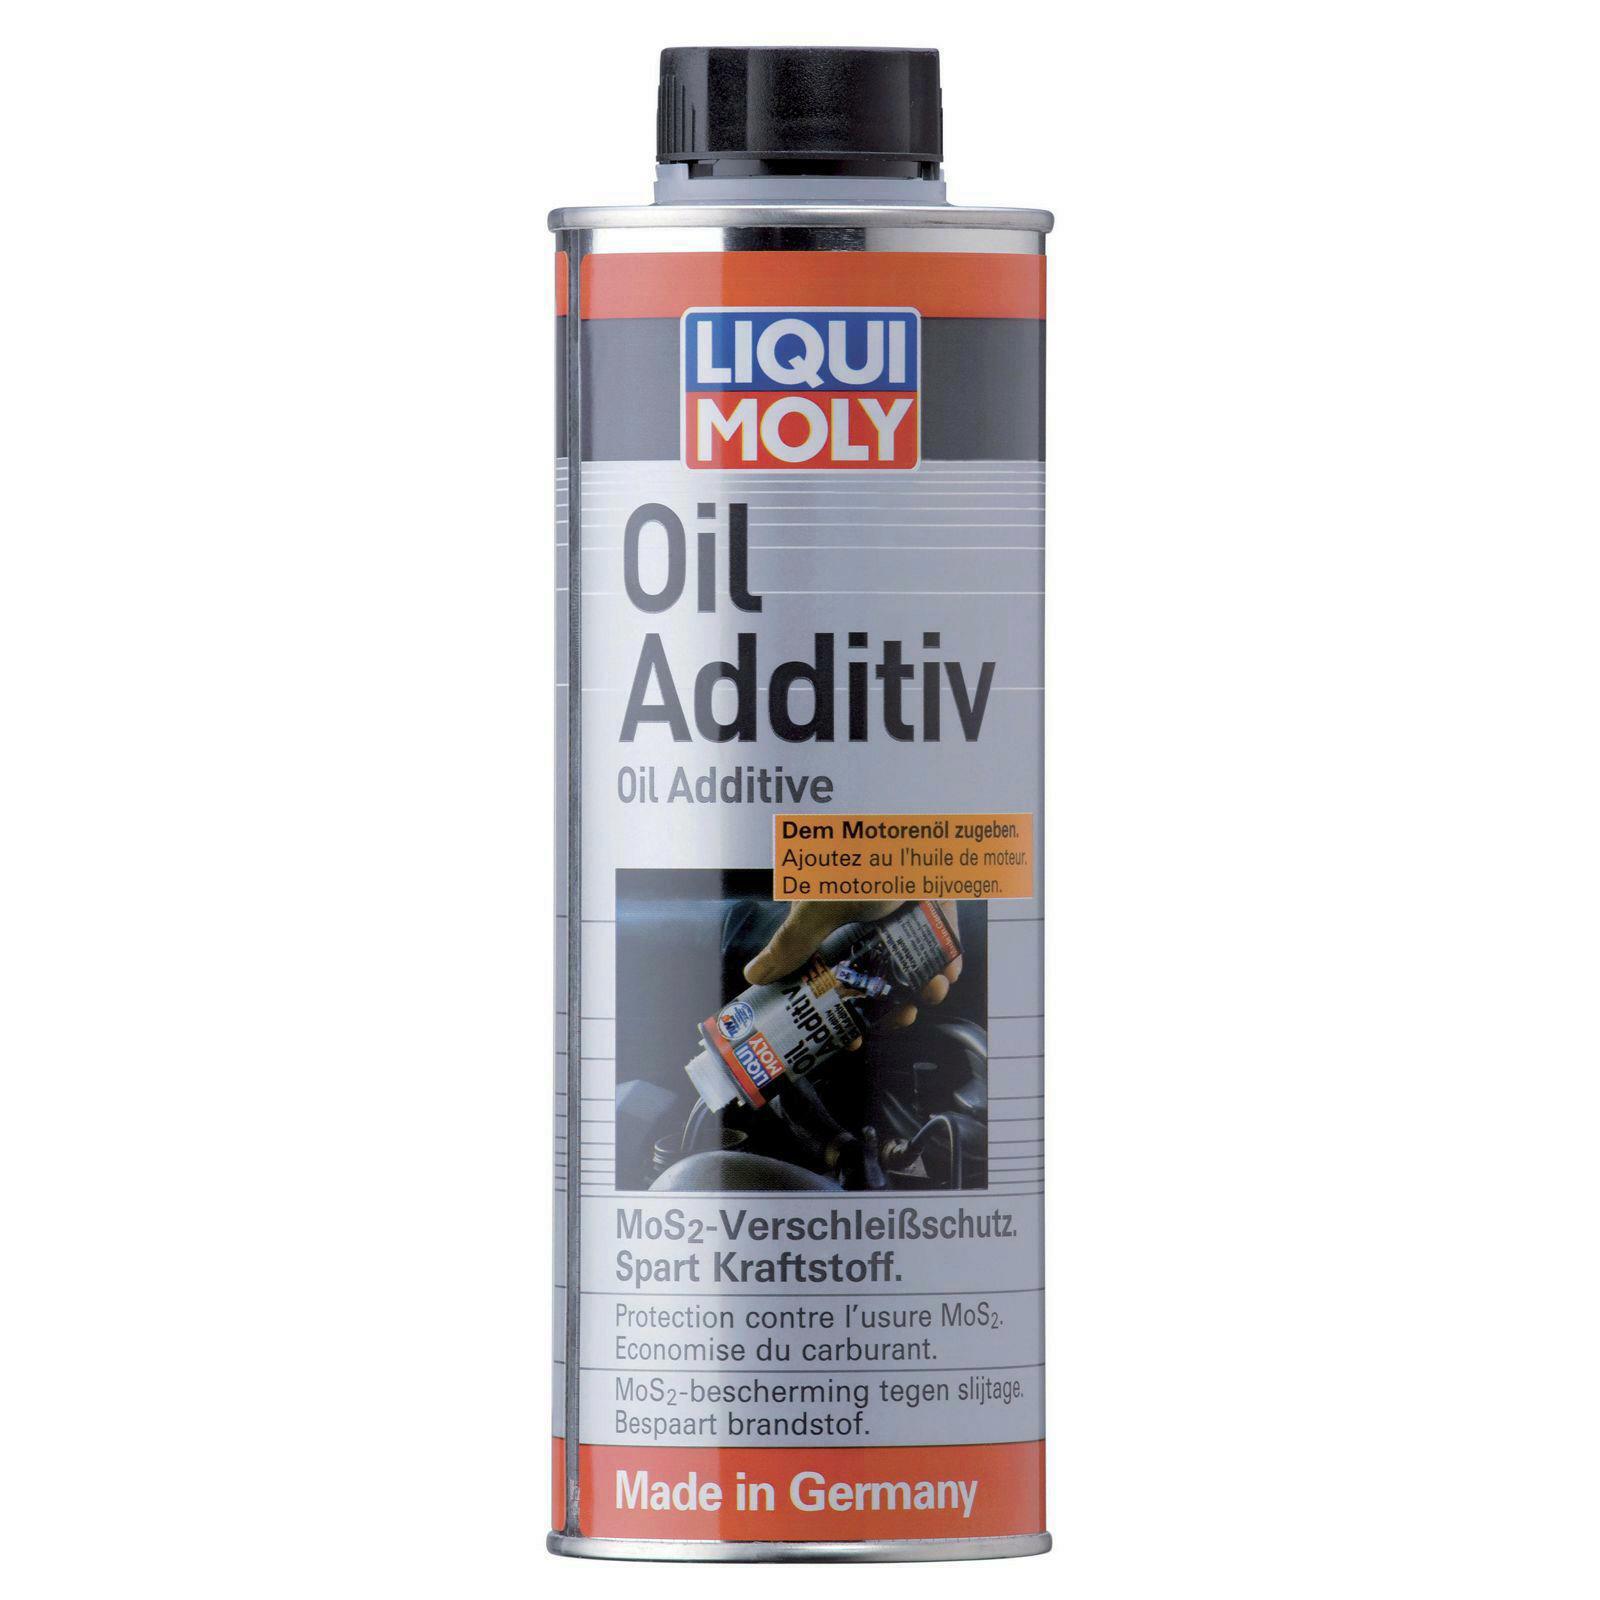 Liqui Moly Öl Additiv 500ml